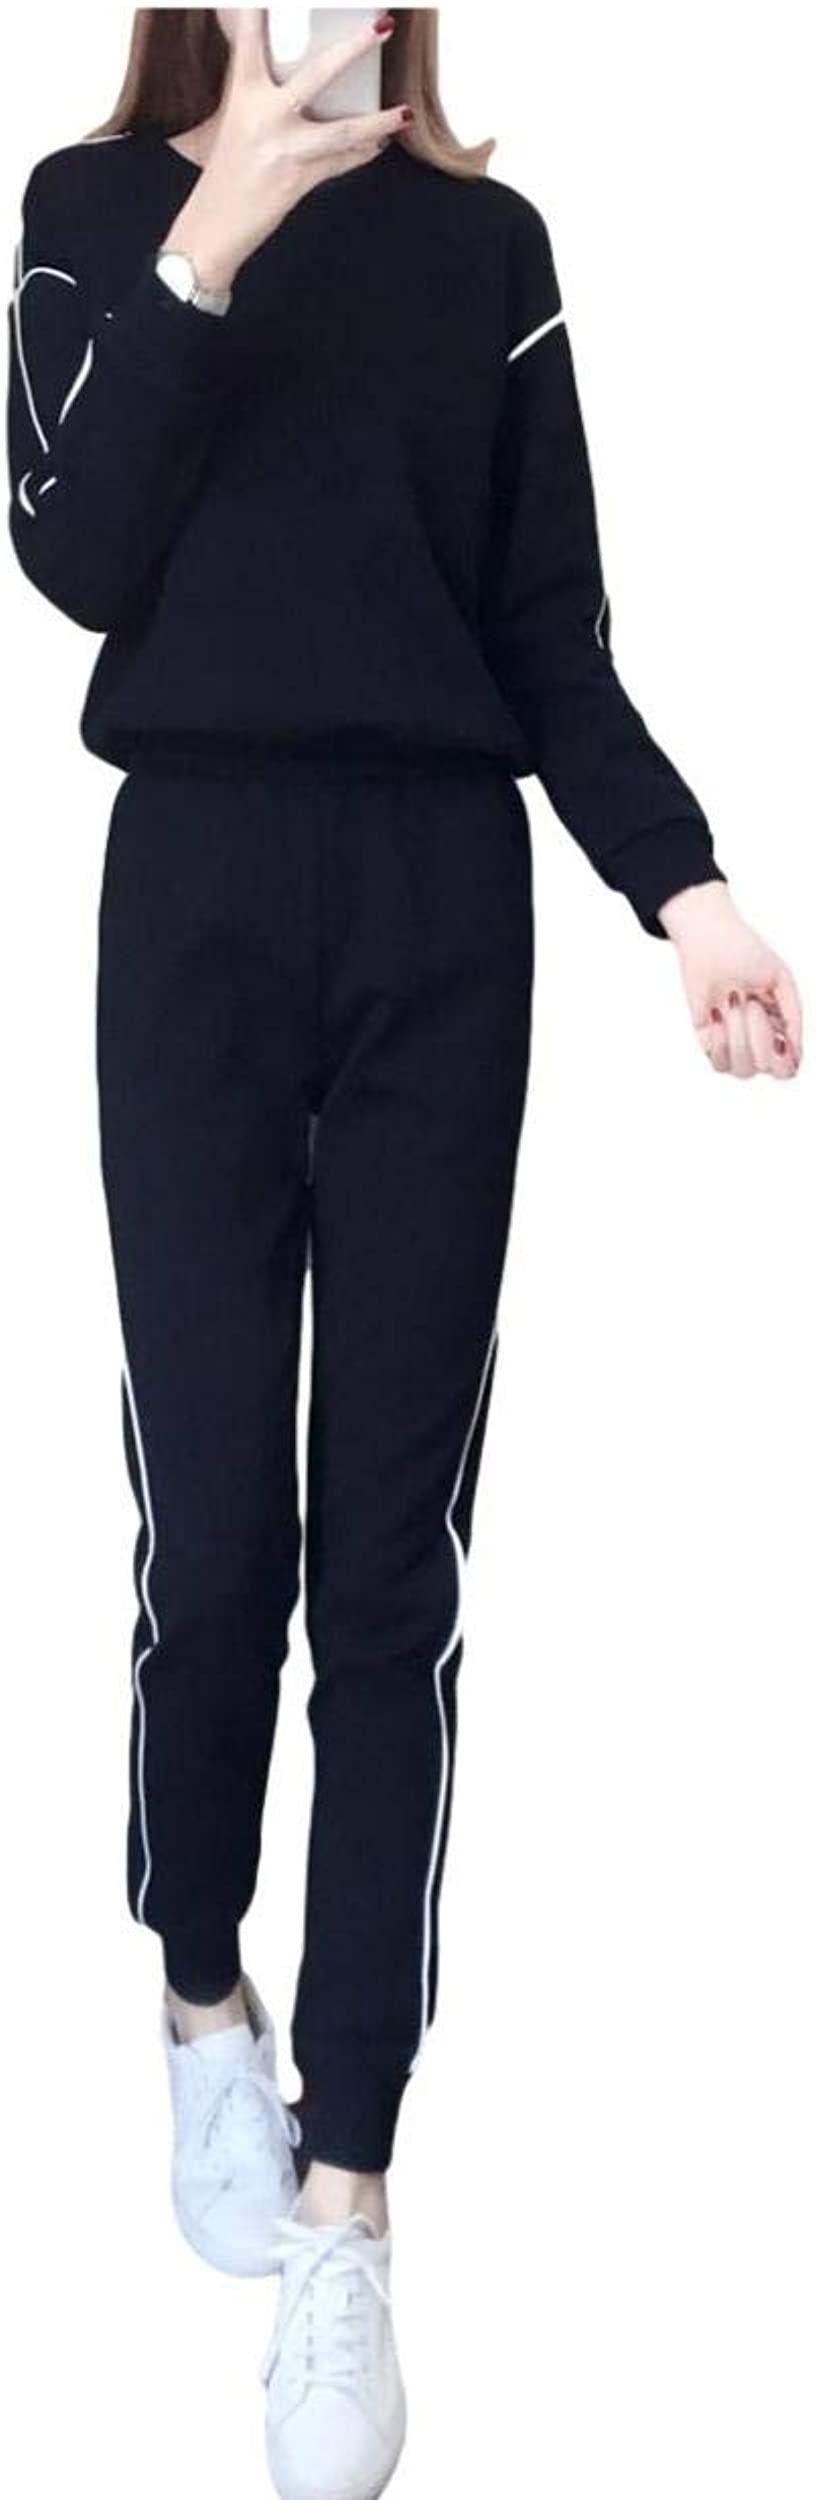 goodspoon  グッドスプン レディース ジャージ 上下 スポーツ ウェアー ランニング トレーニング フリーサイズ(ブラック, Free Size)